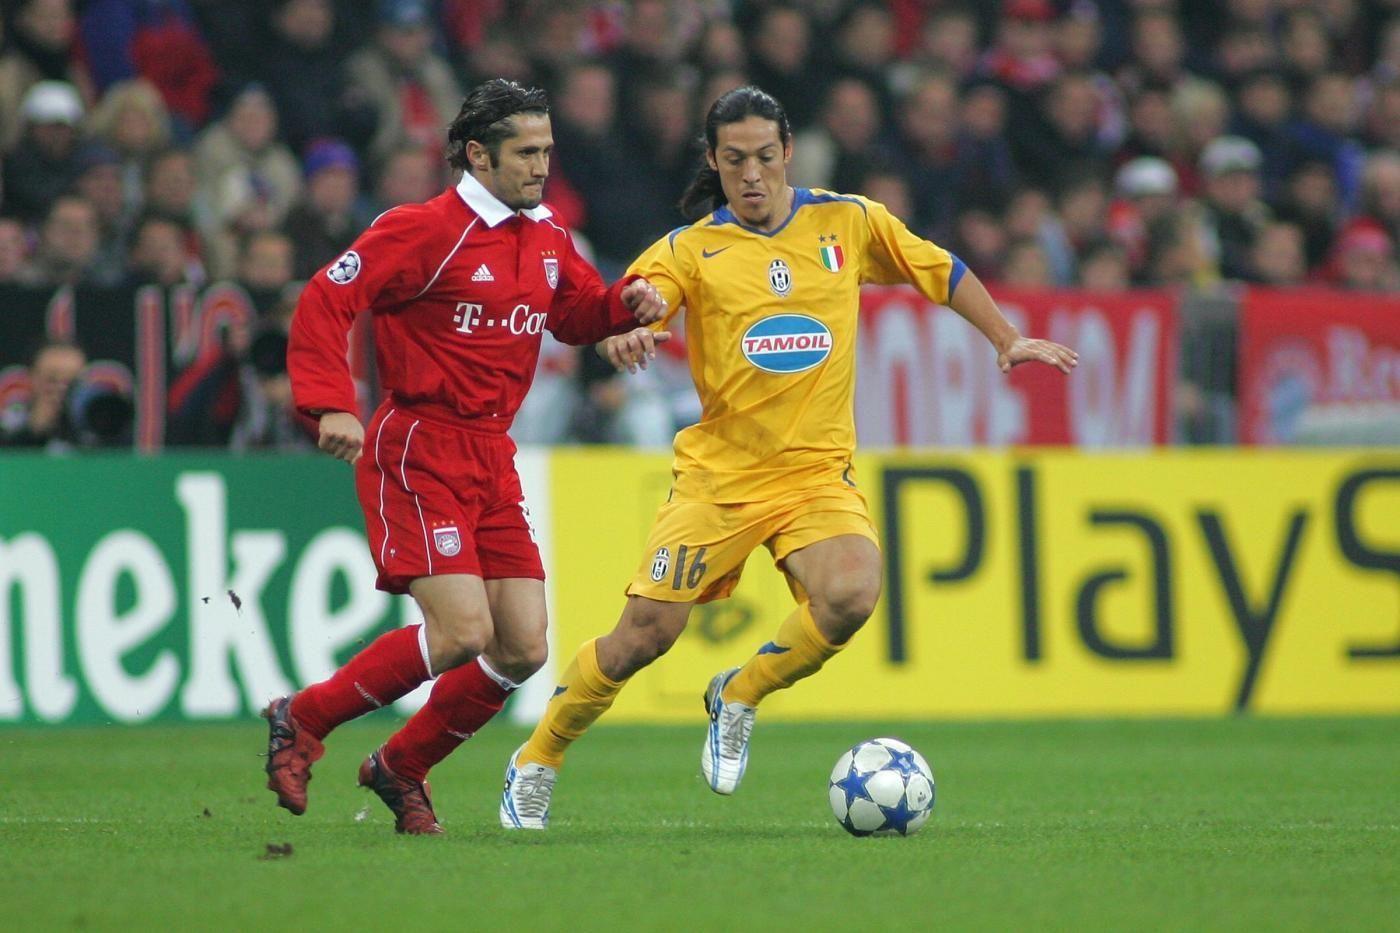 Bayern Monaco vs Juventus UEFA Champions League 2005 2006